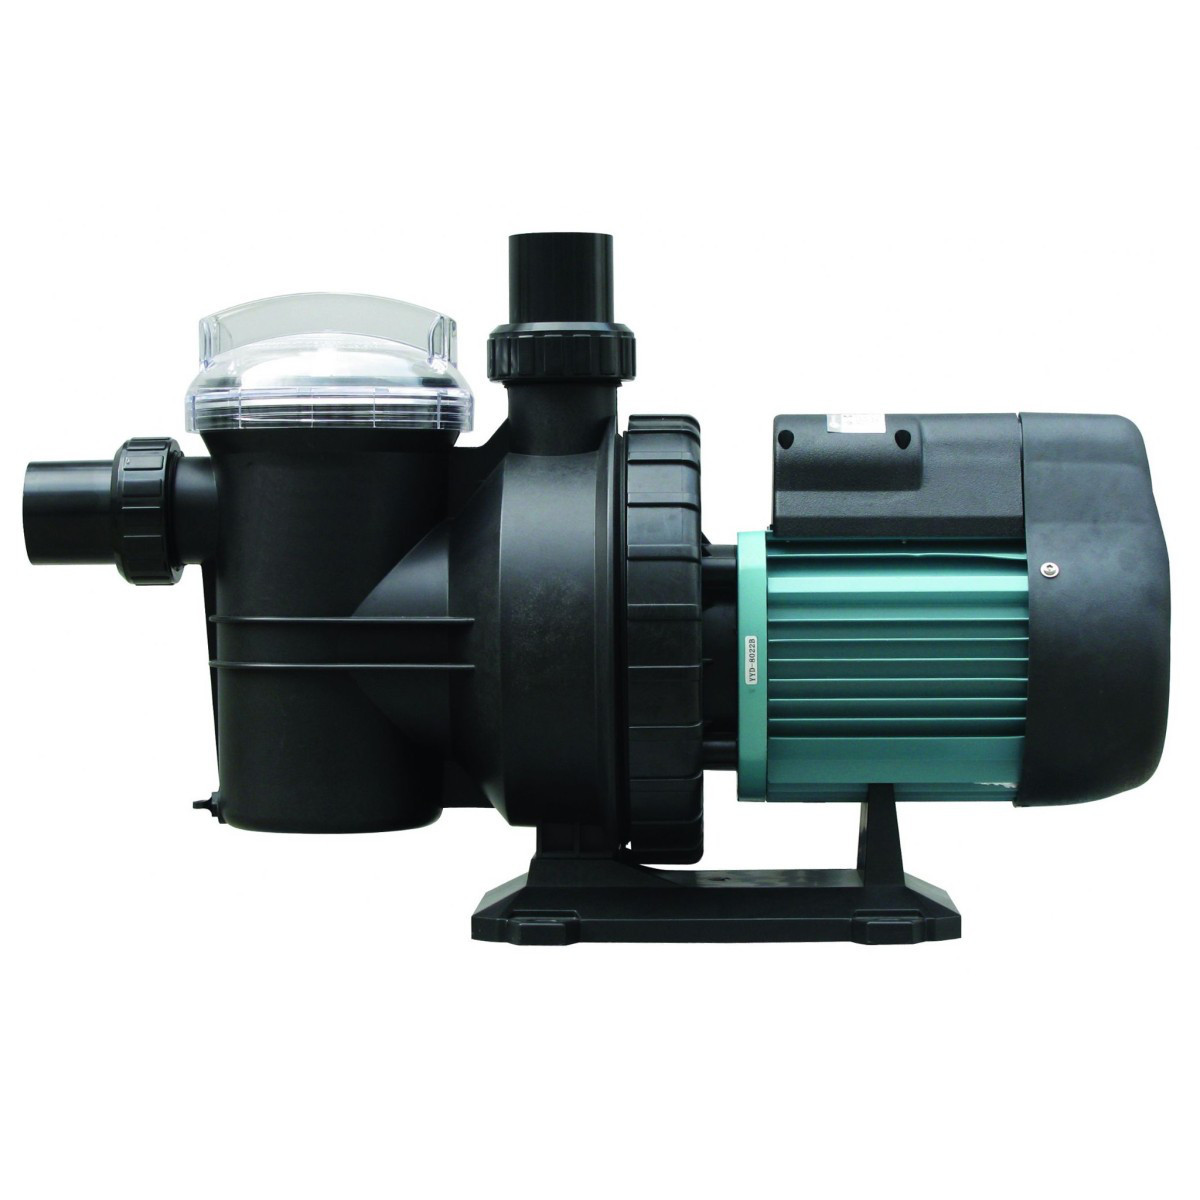 Насос Emaux SC075 (220В, 13 м³/час, 0.75HP)